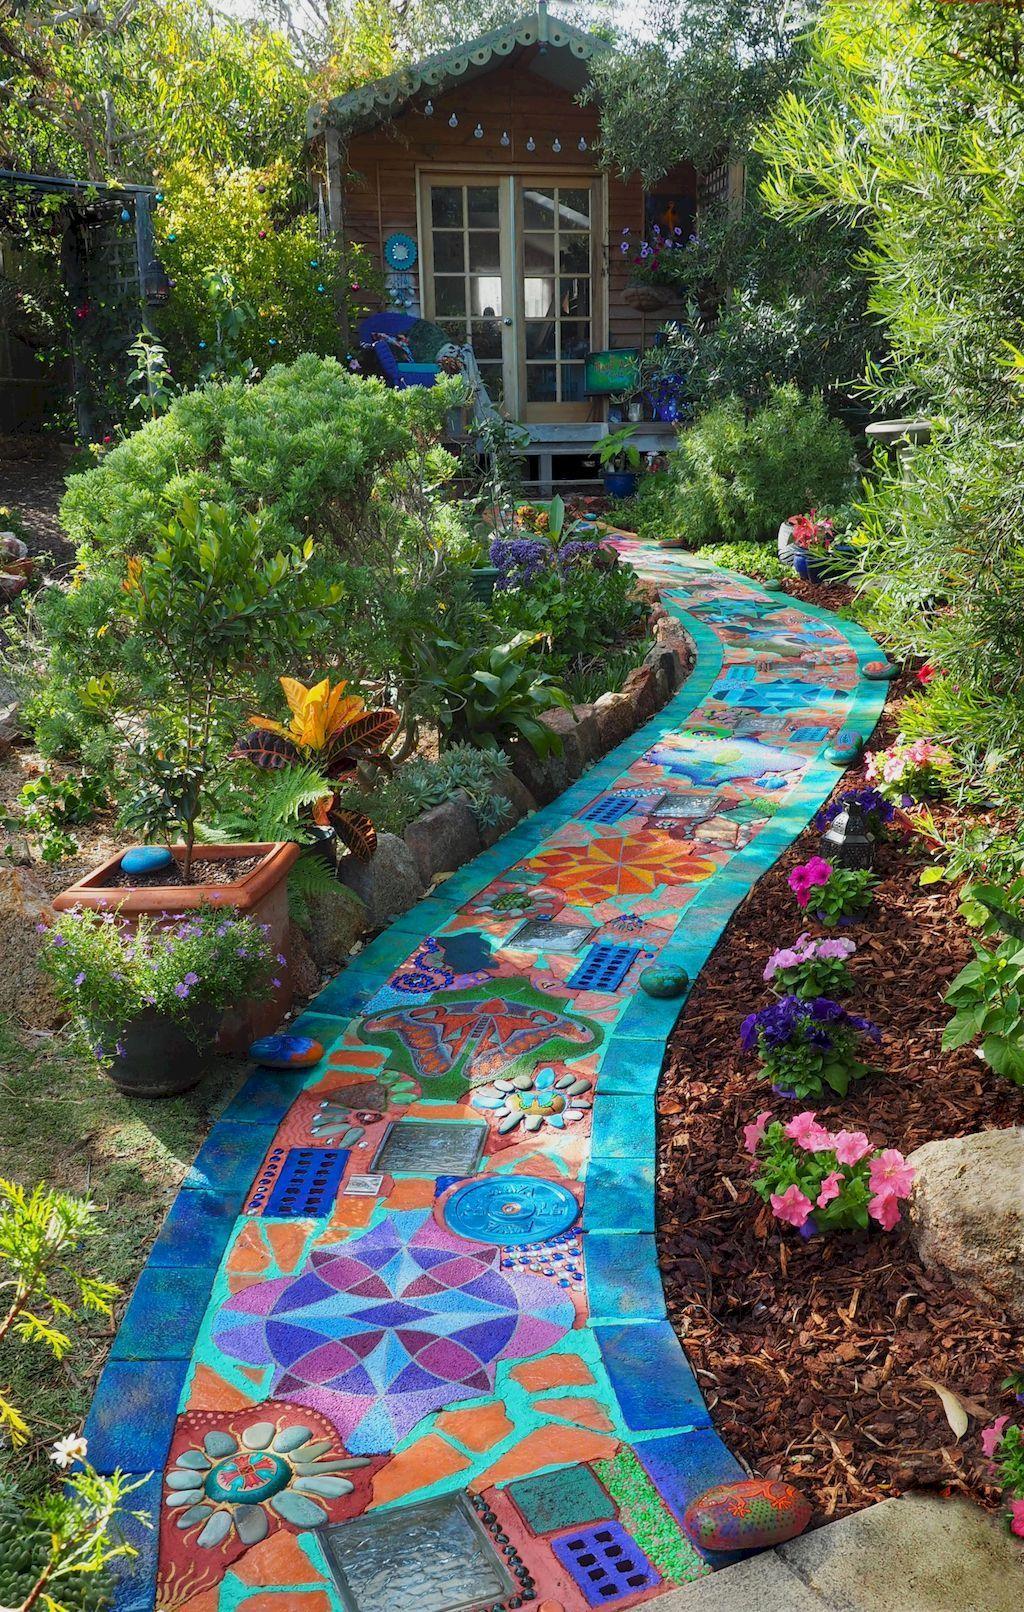 Garden Design In 2020 Backyard Landscaping Designs Landscape Design Unique Gardens